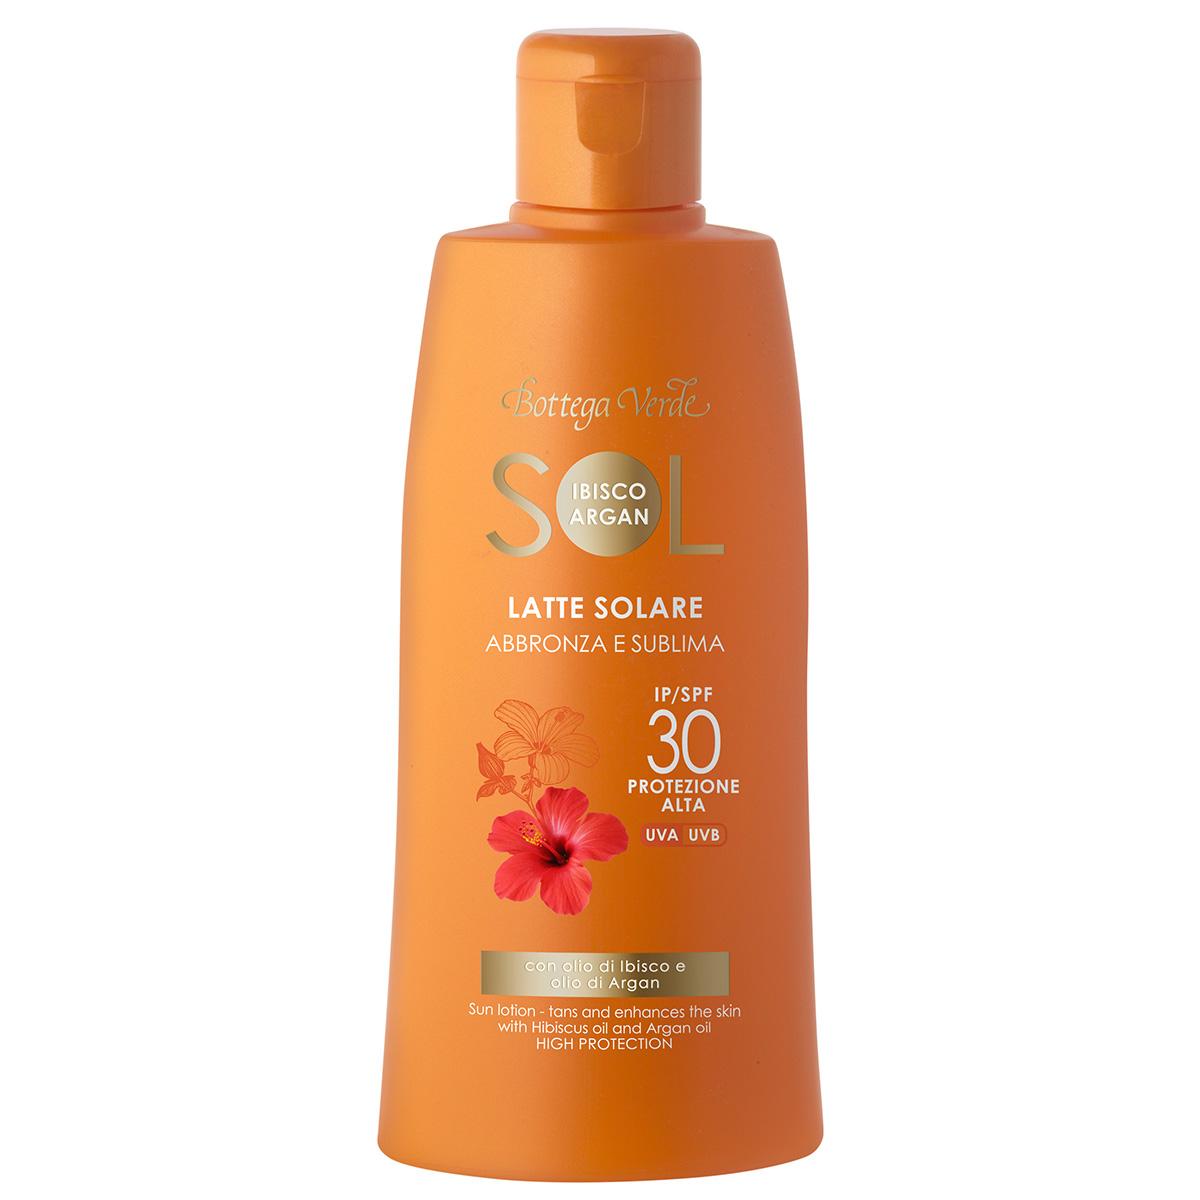 Lapte de corp pentru plaja cu ulei de hibiscus si argan - waterproof - Sol Ibisco Argan, 200 ML